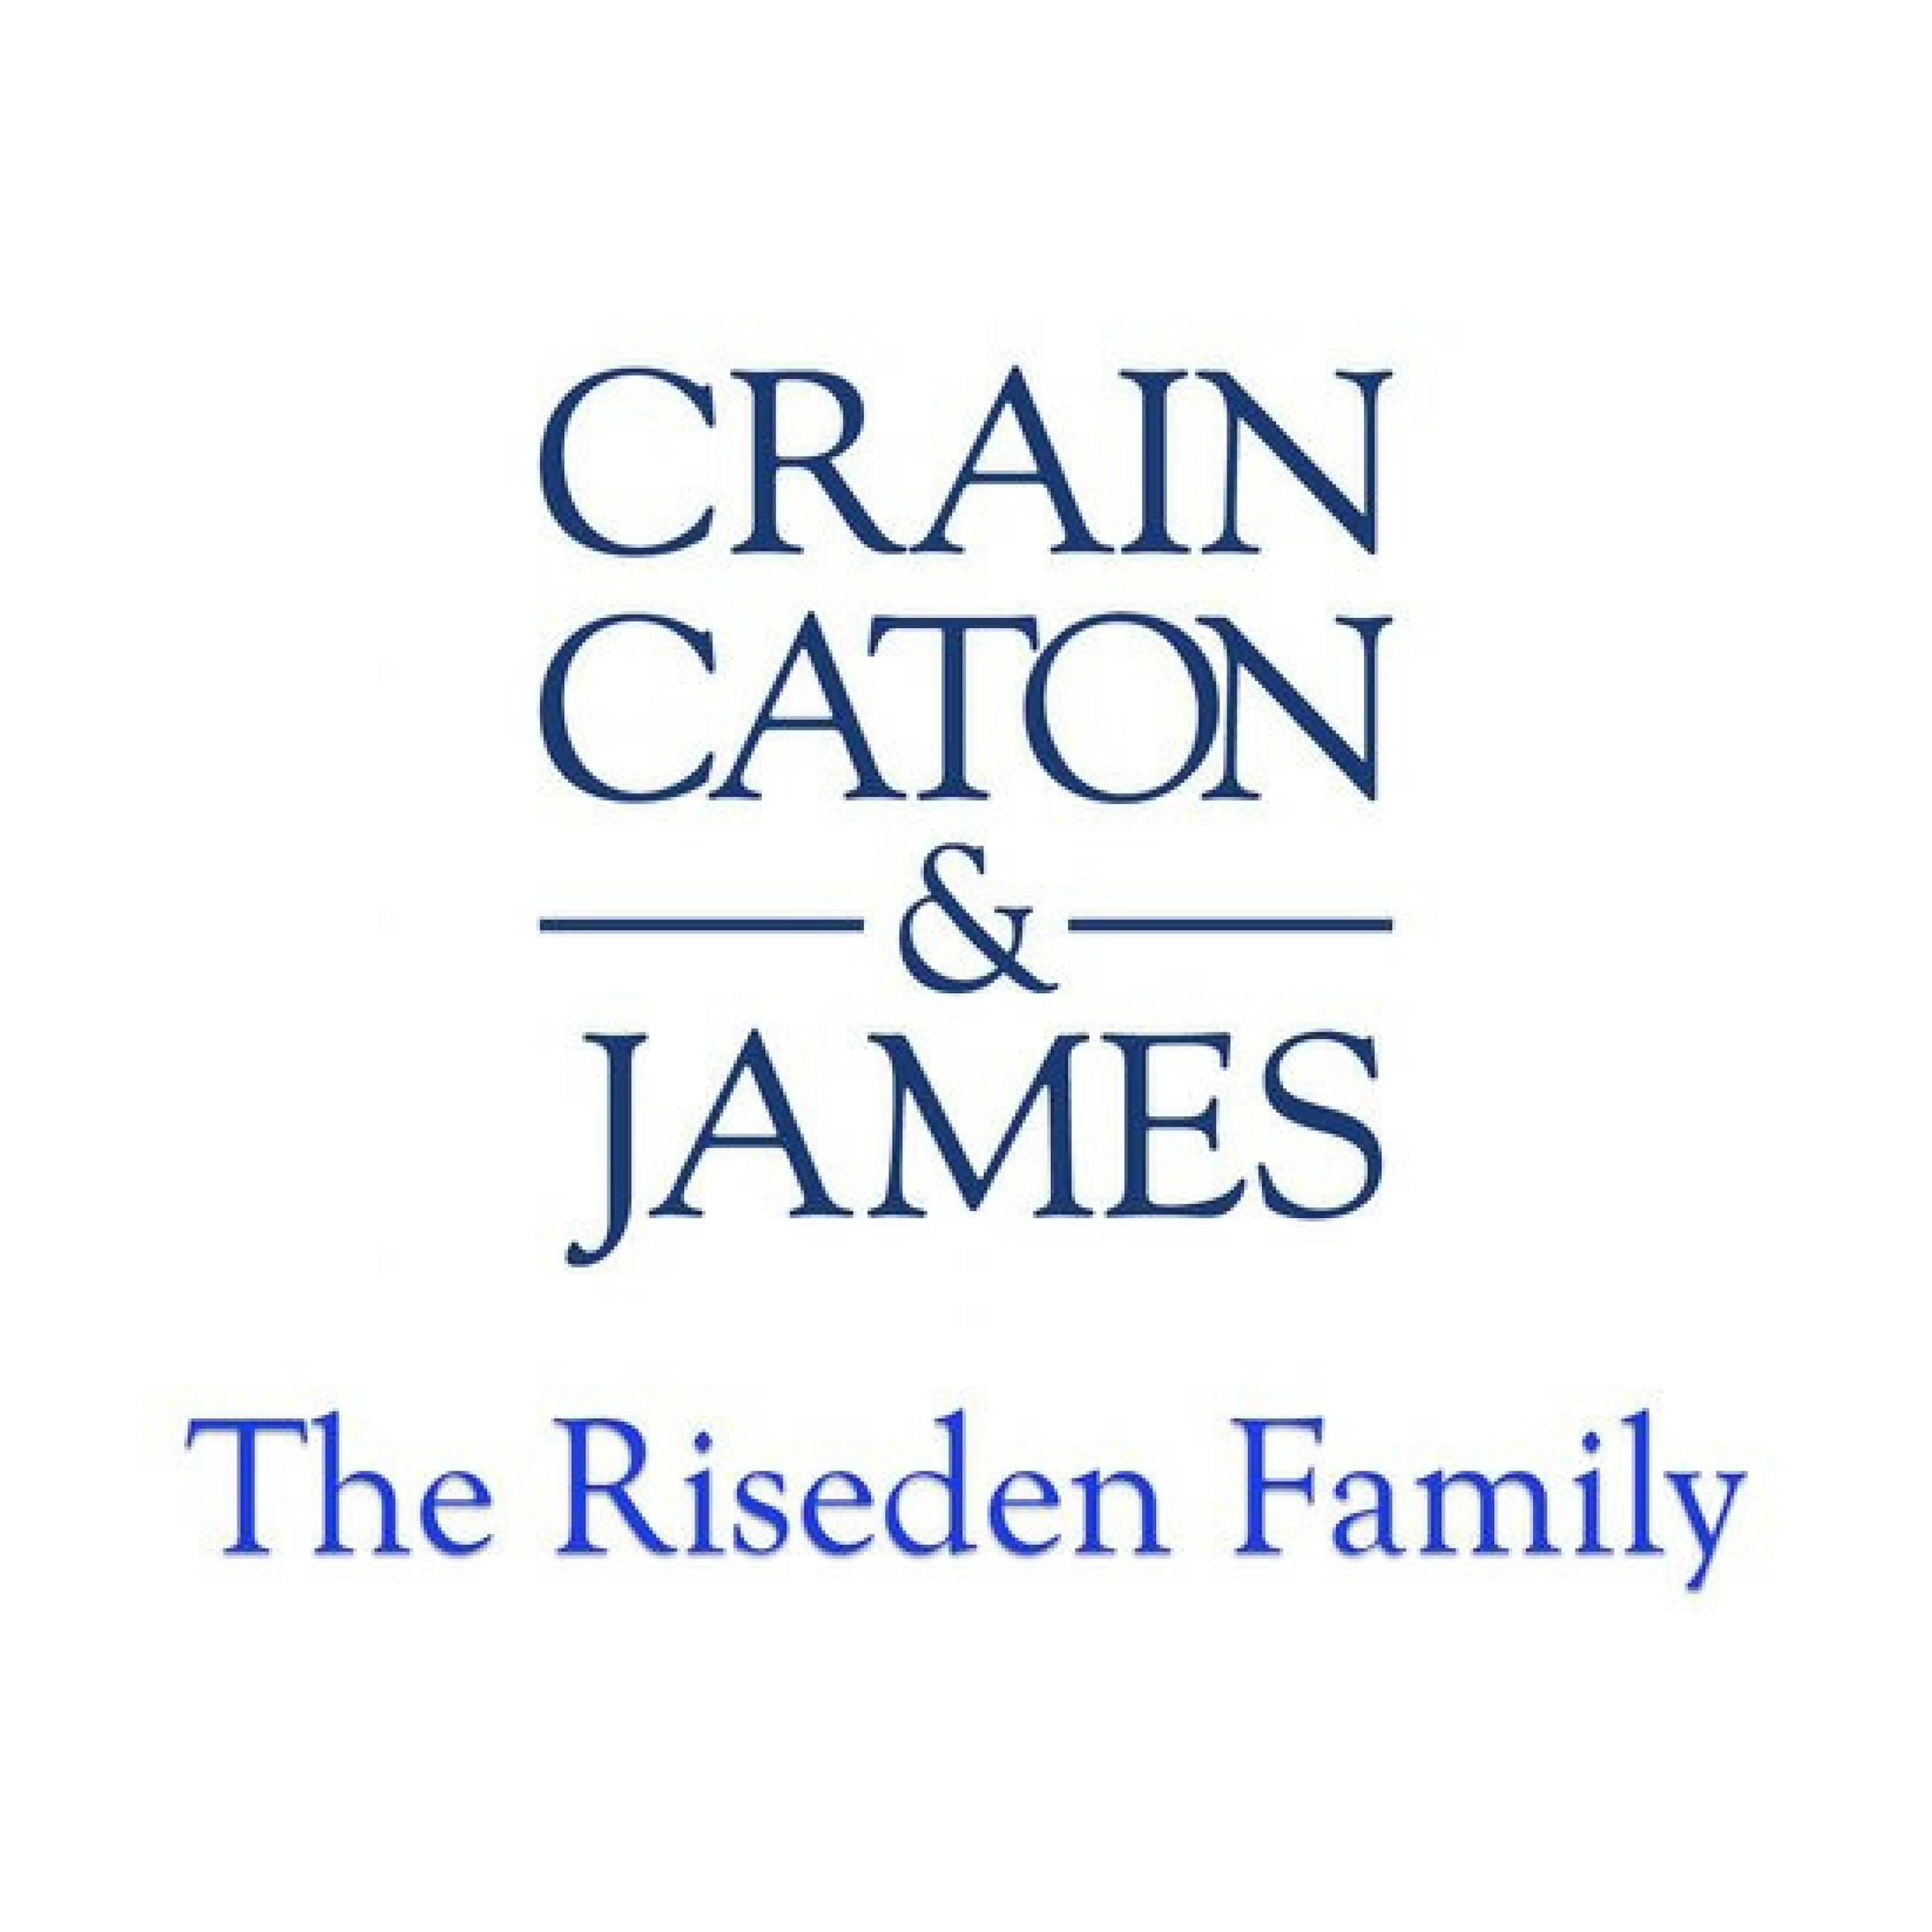 CRAIN CATON & JAMES - COMPANY LOGO.png